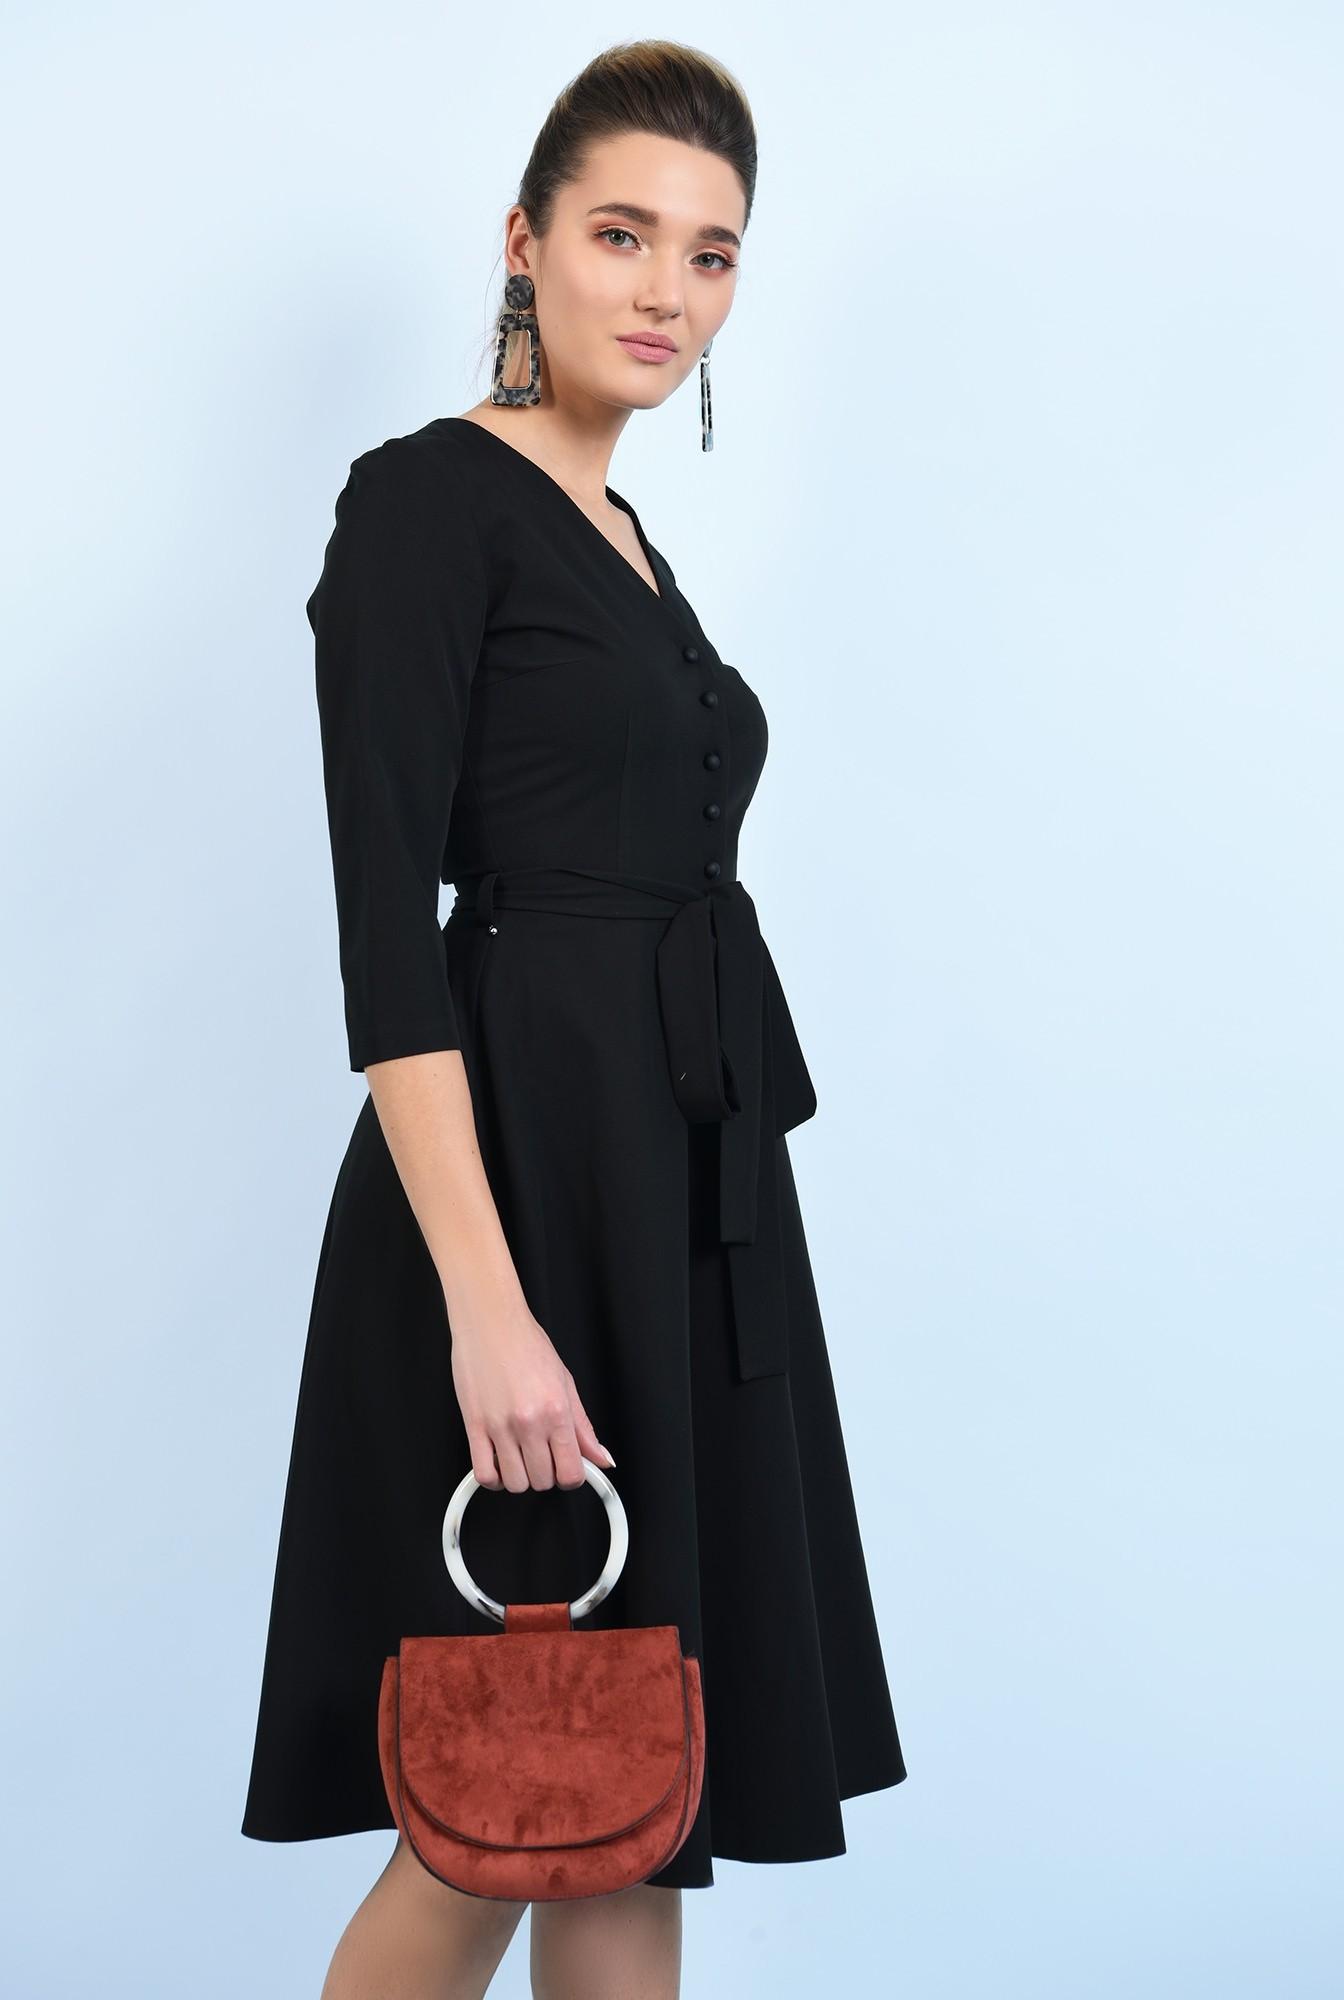 0 - 360 - rochie office, neagra, midi, cu nasturi, cu cordon